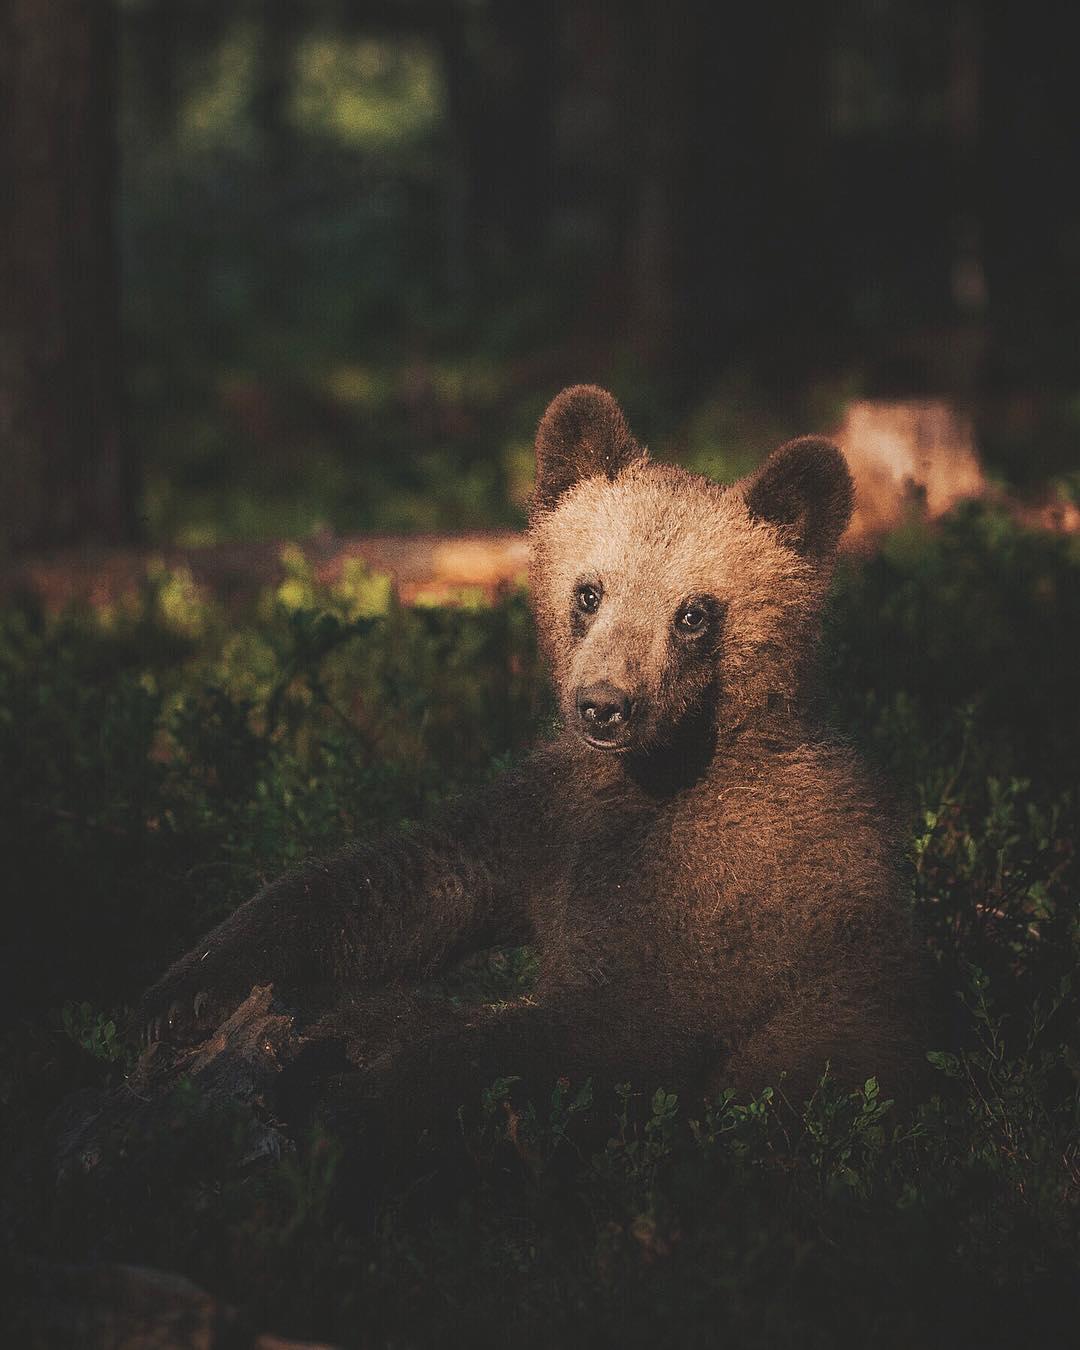 Beautiful Bear Photography wildlife ©Konsta Punkka